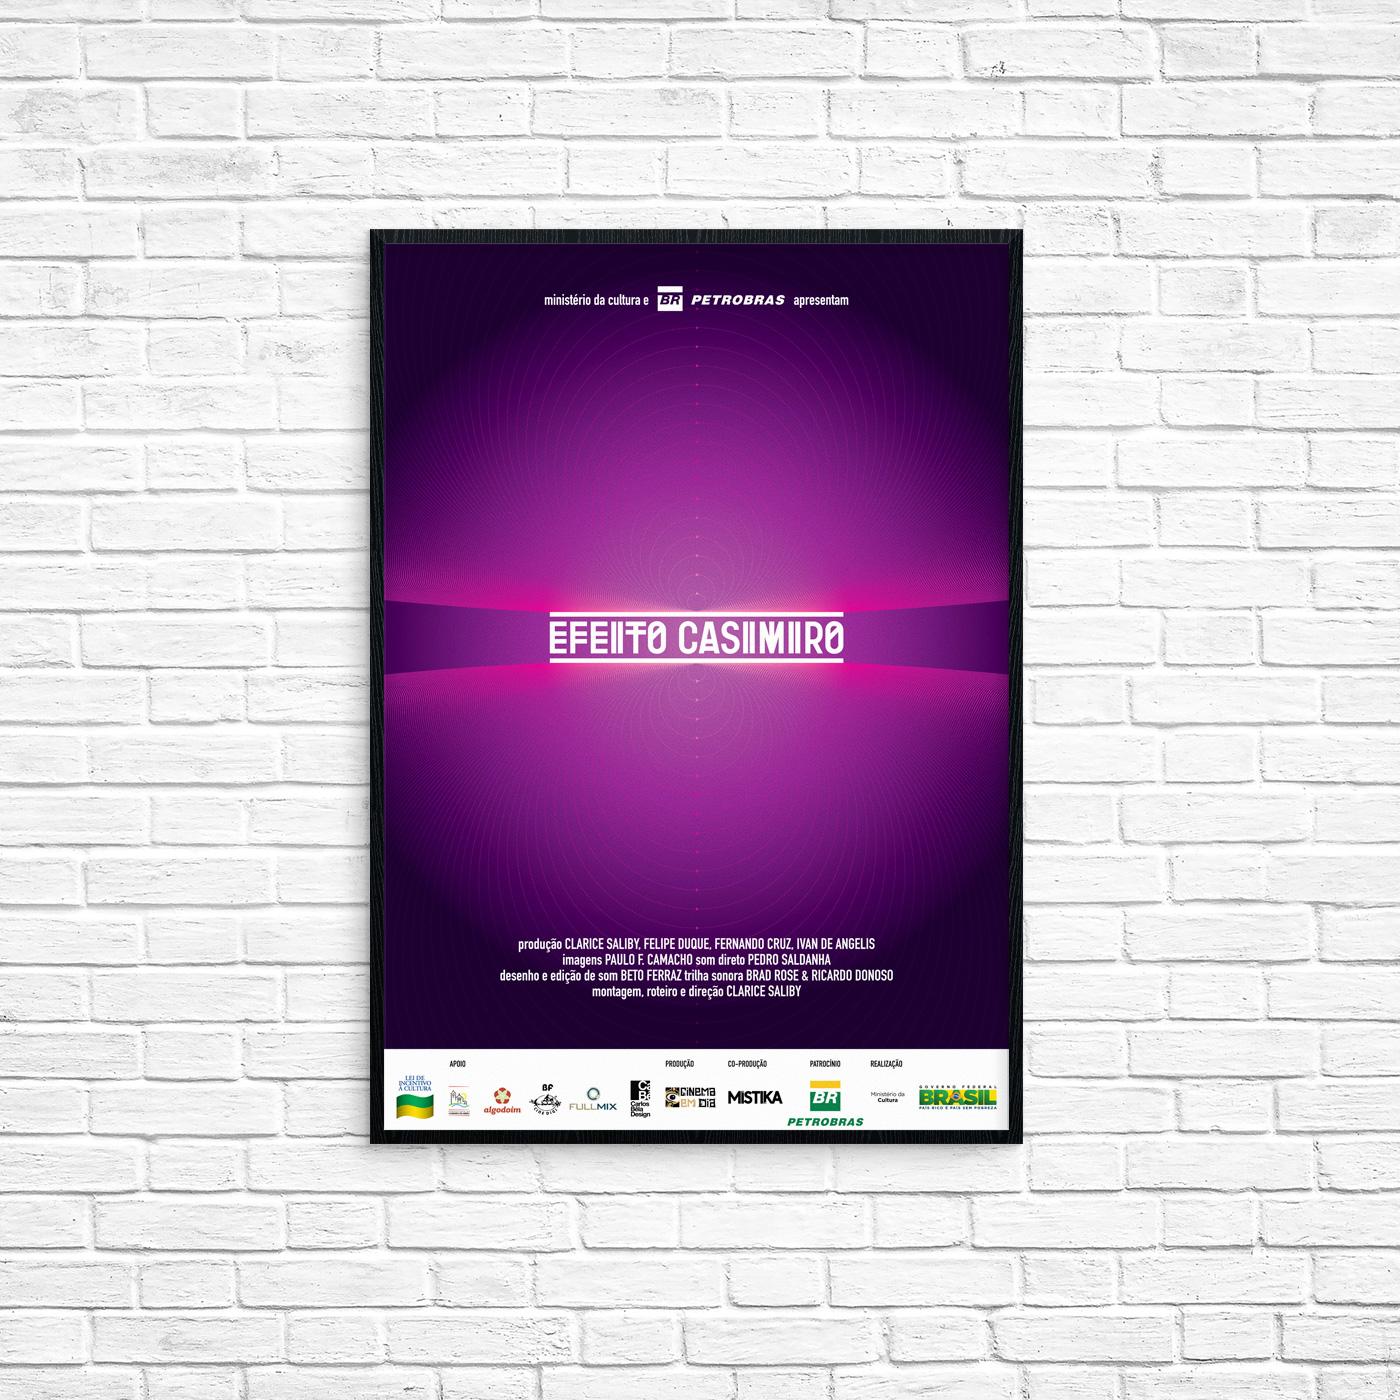 efeito-casimiro-Mockup-Poster